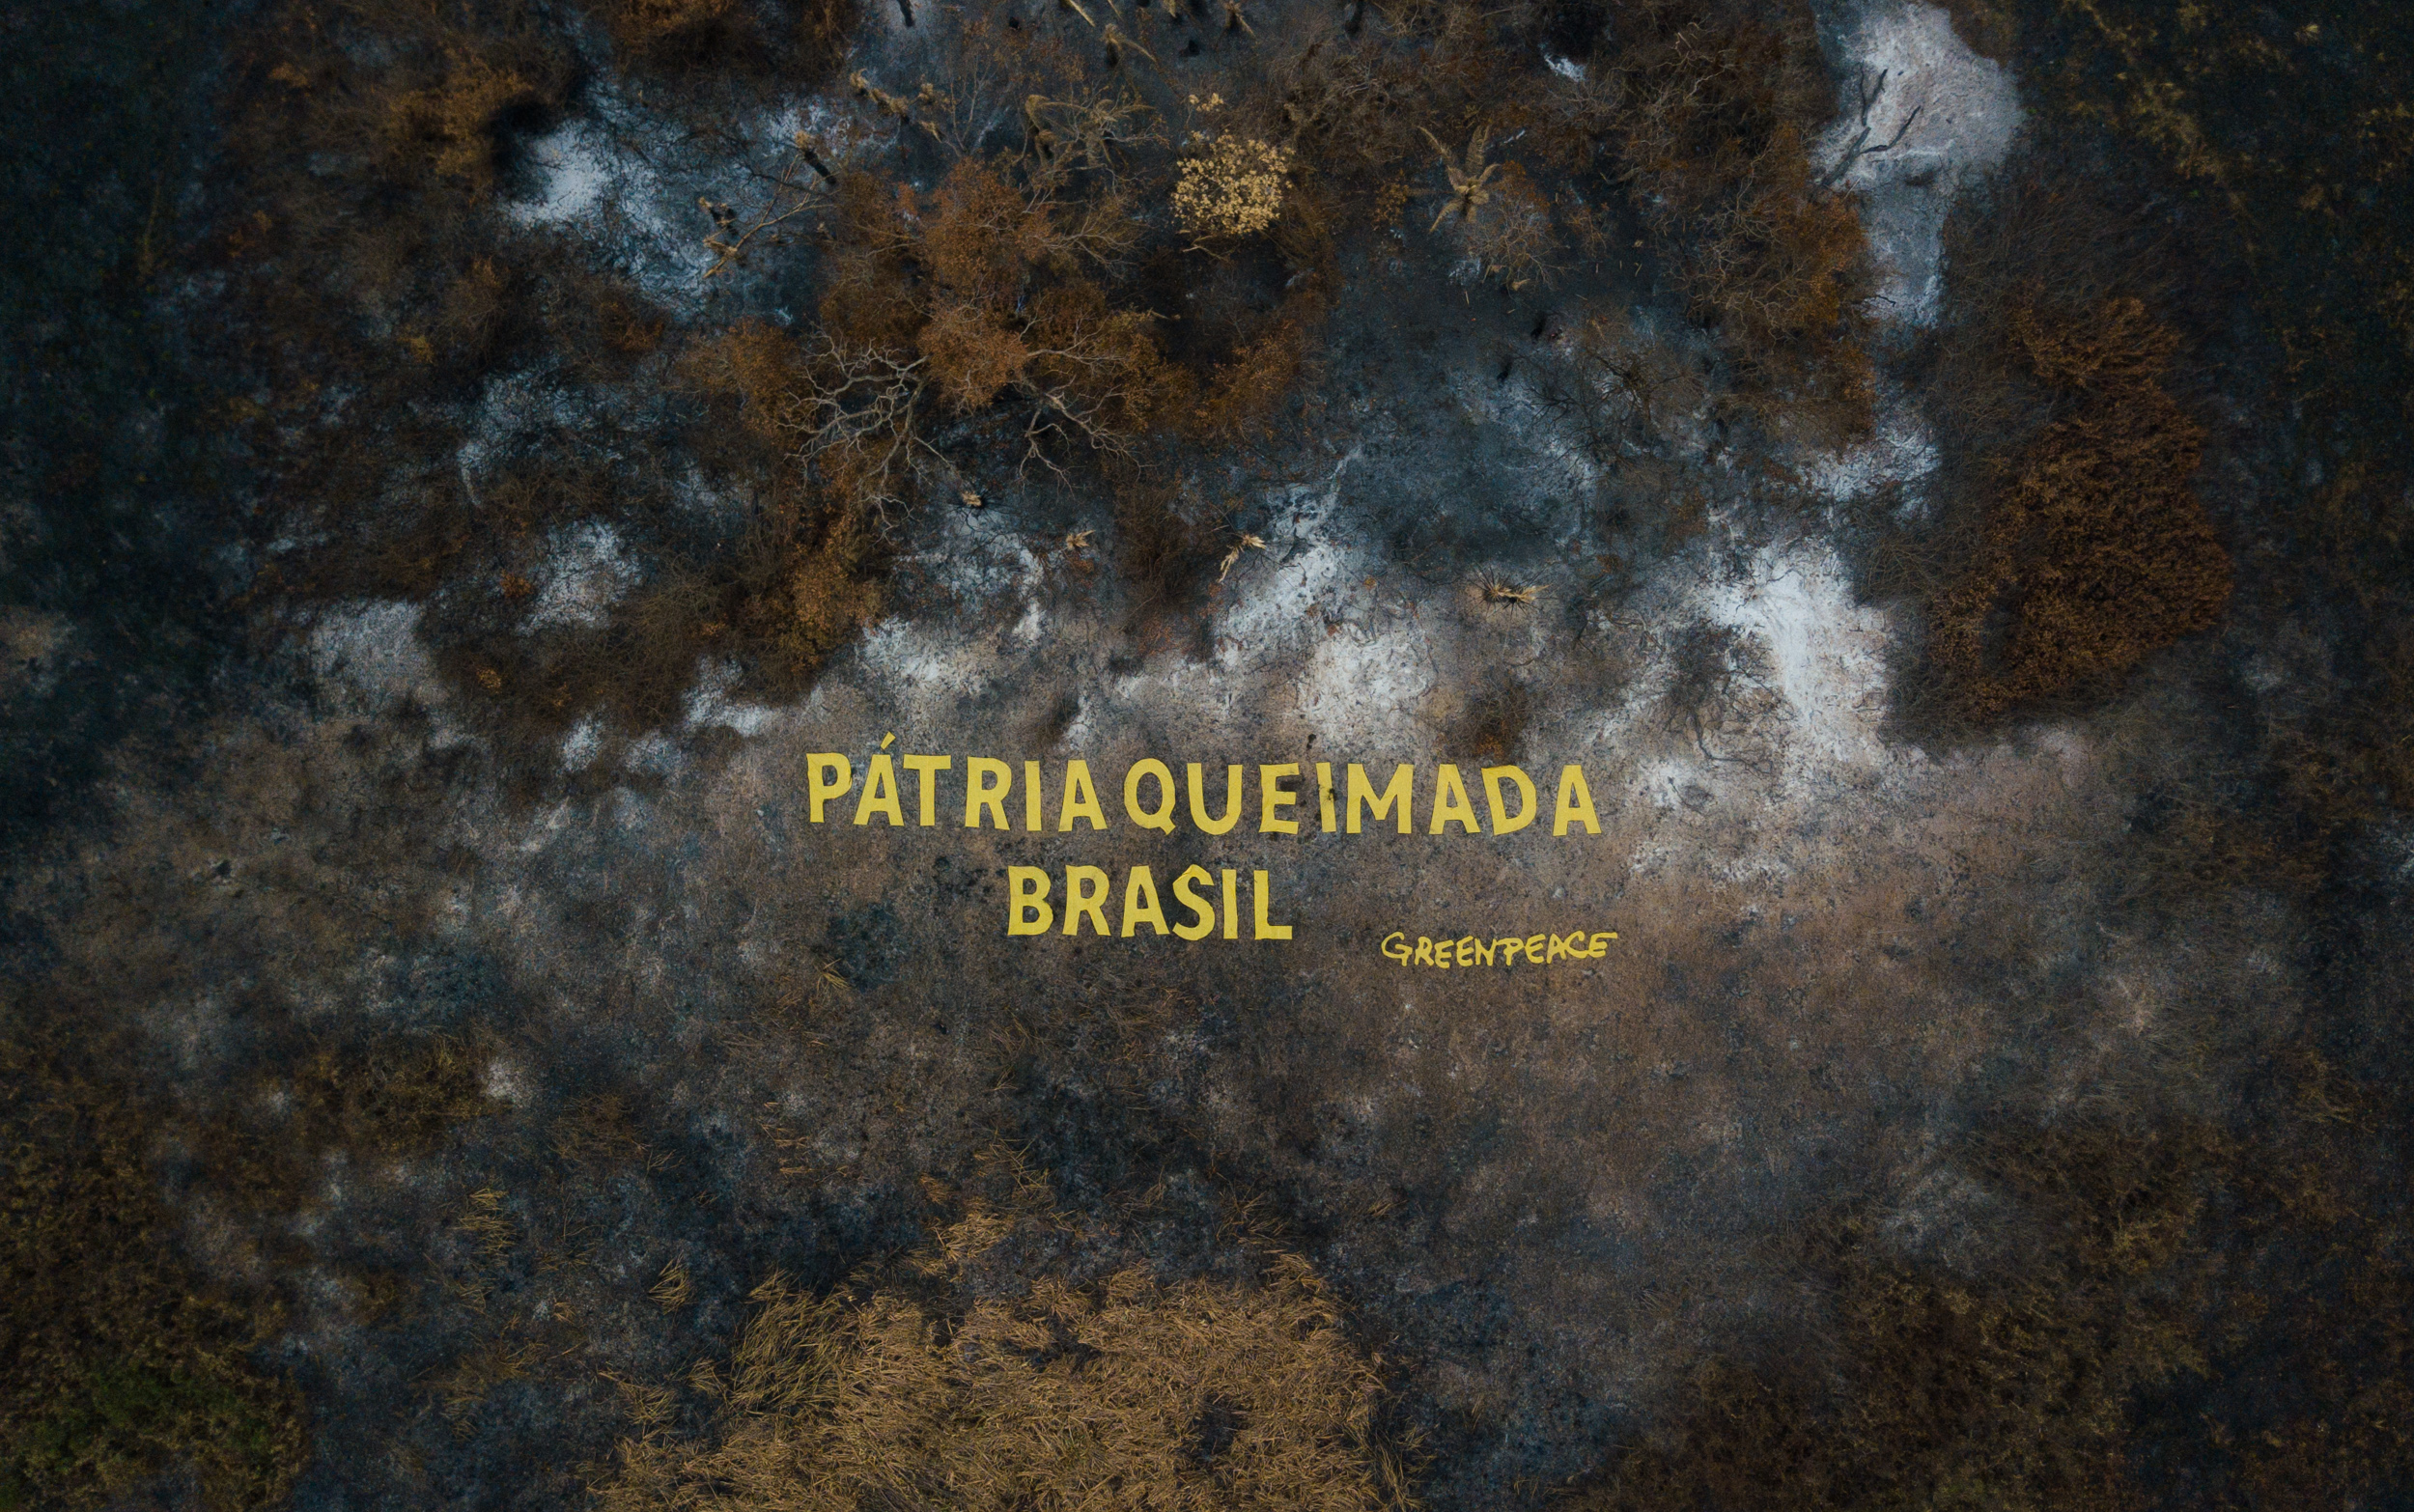 Pátria Queimada Brasil: política incendiária do governo ameaça futuro do país - Greenpeace Brasil